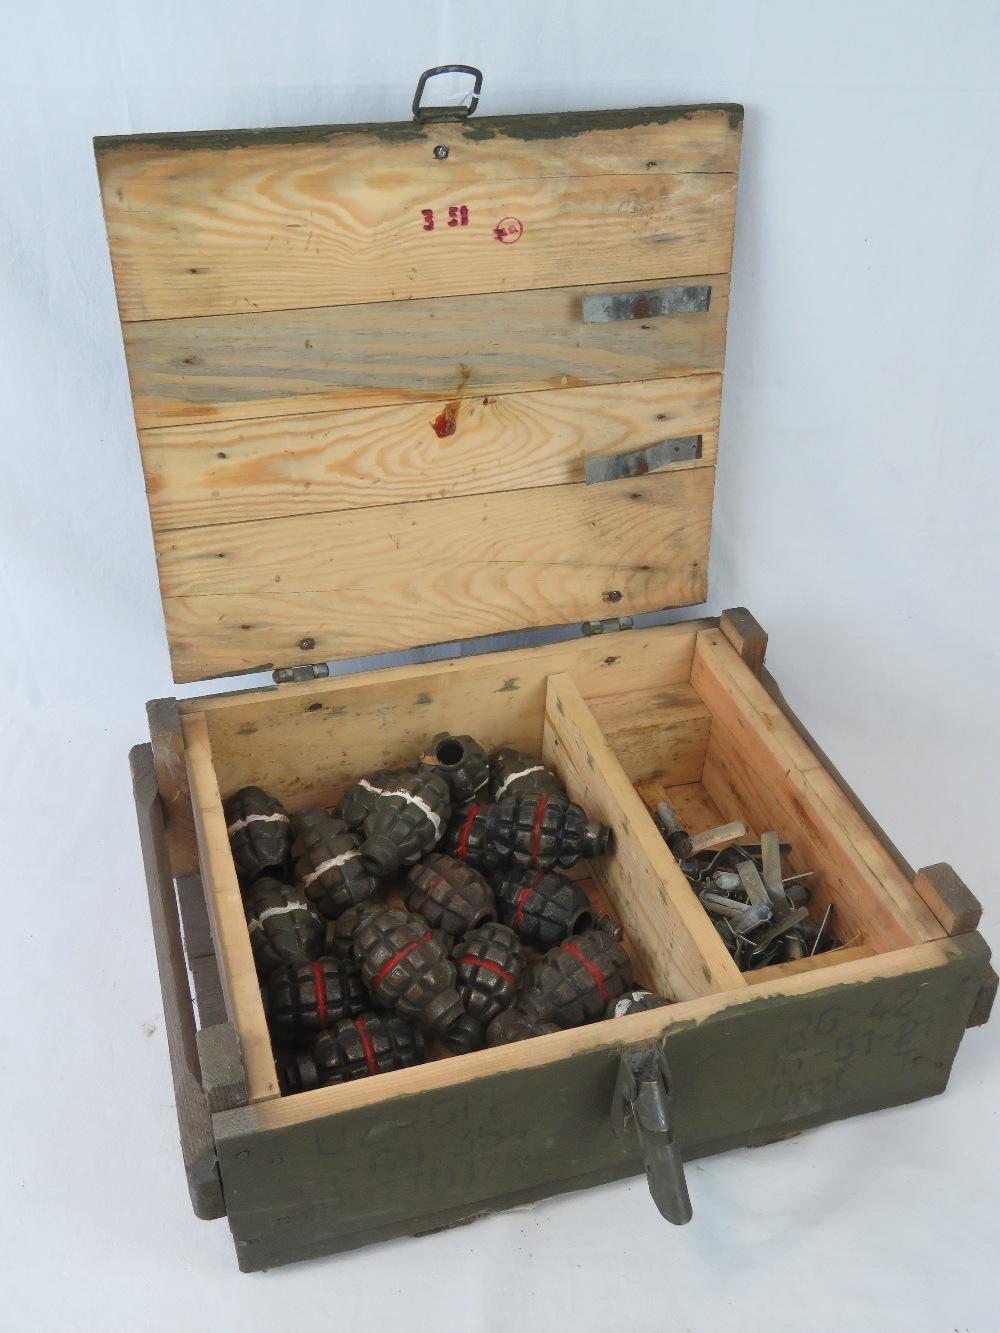 Lot 12 - Twenty inert Soviet F1 Limonka practice Pineapple Grenades with screw in fuses,